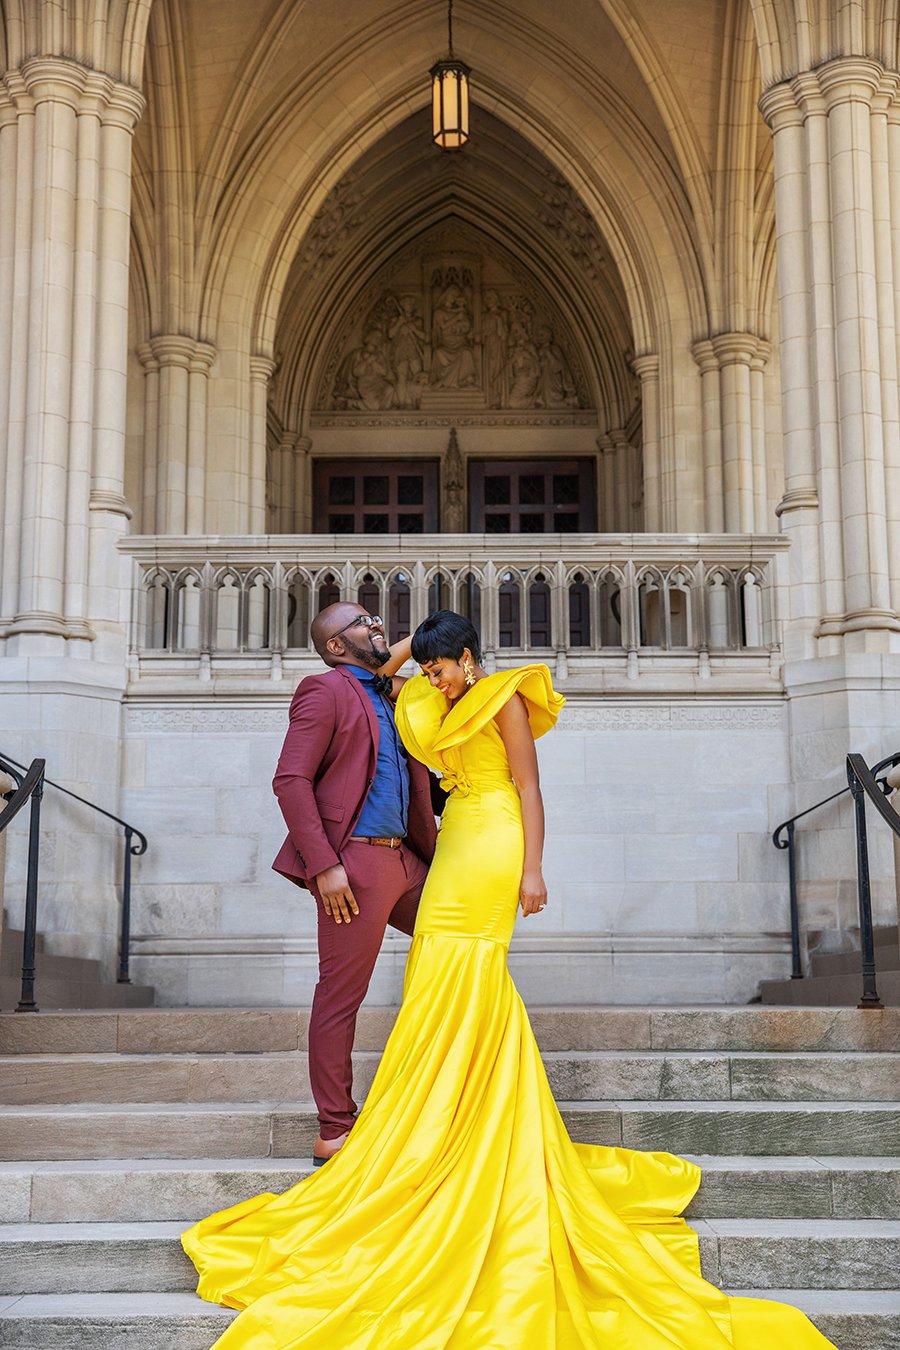 stella-adewunmi-of-jadore-fashion-blog-shares-10-years-wedding-anniversary-photoshoot